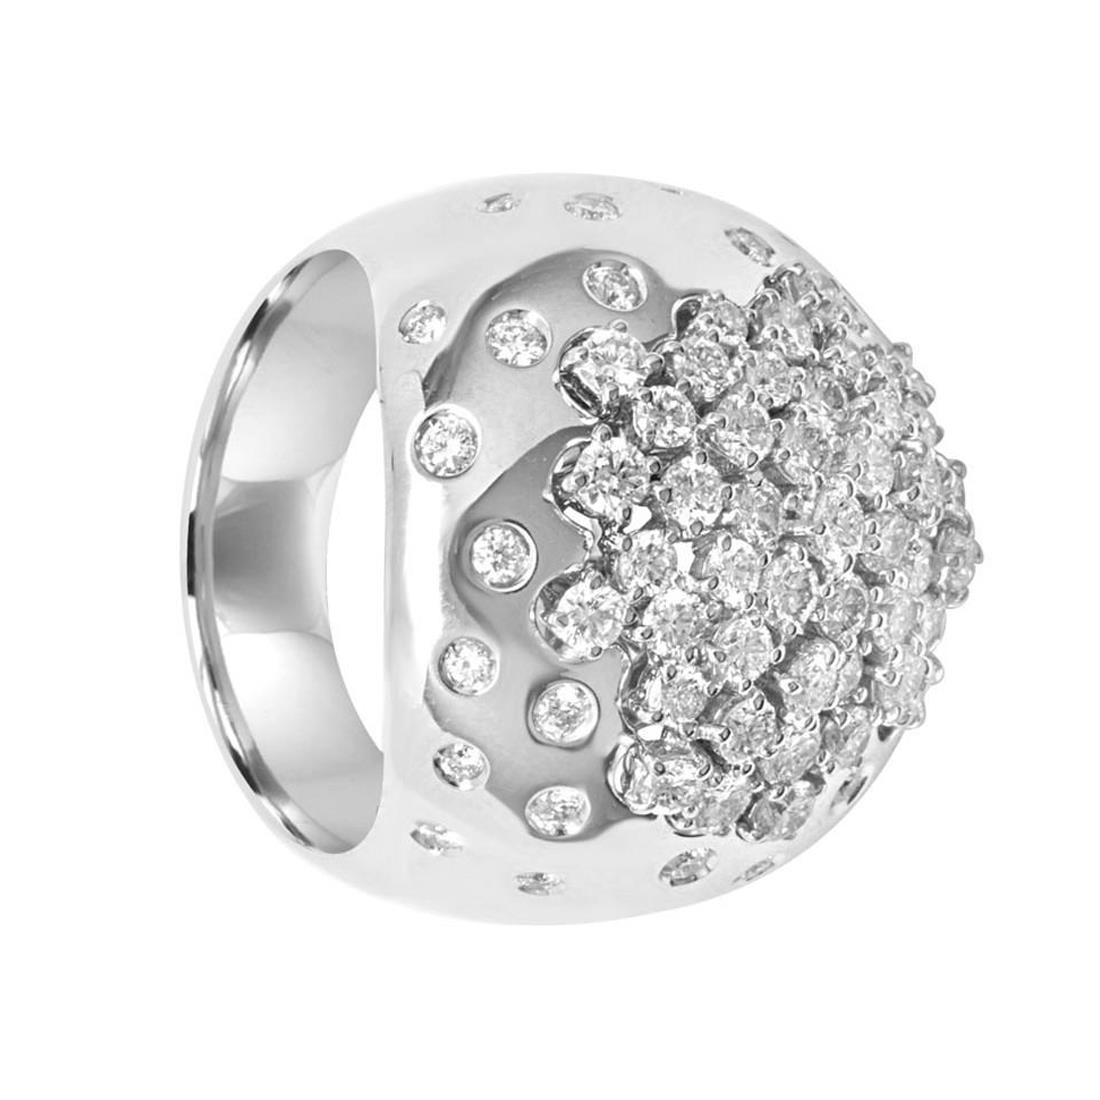 Anello Damiani Paradise in oro bianco con diamanti ct 1,7 - DAMIANI